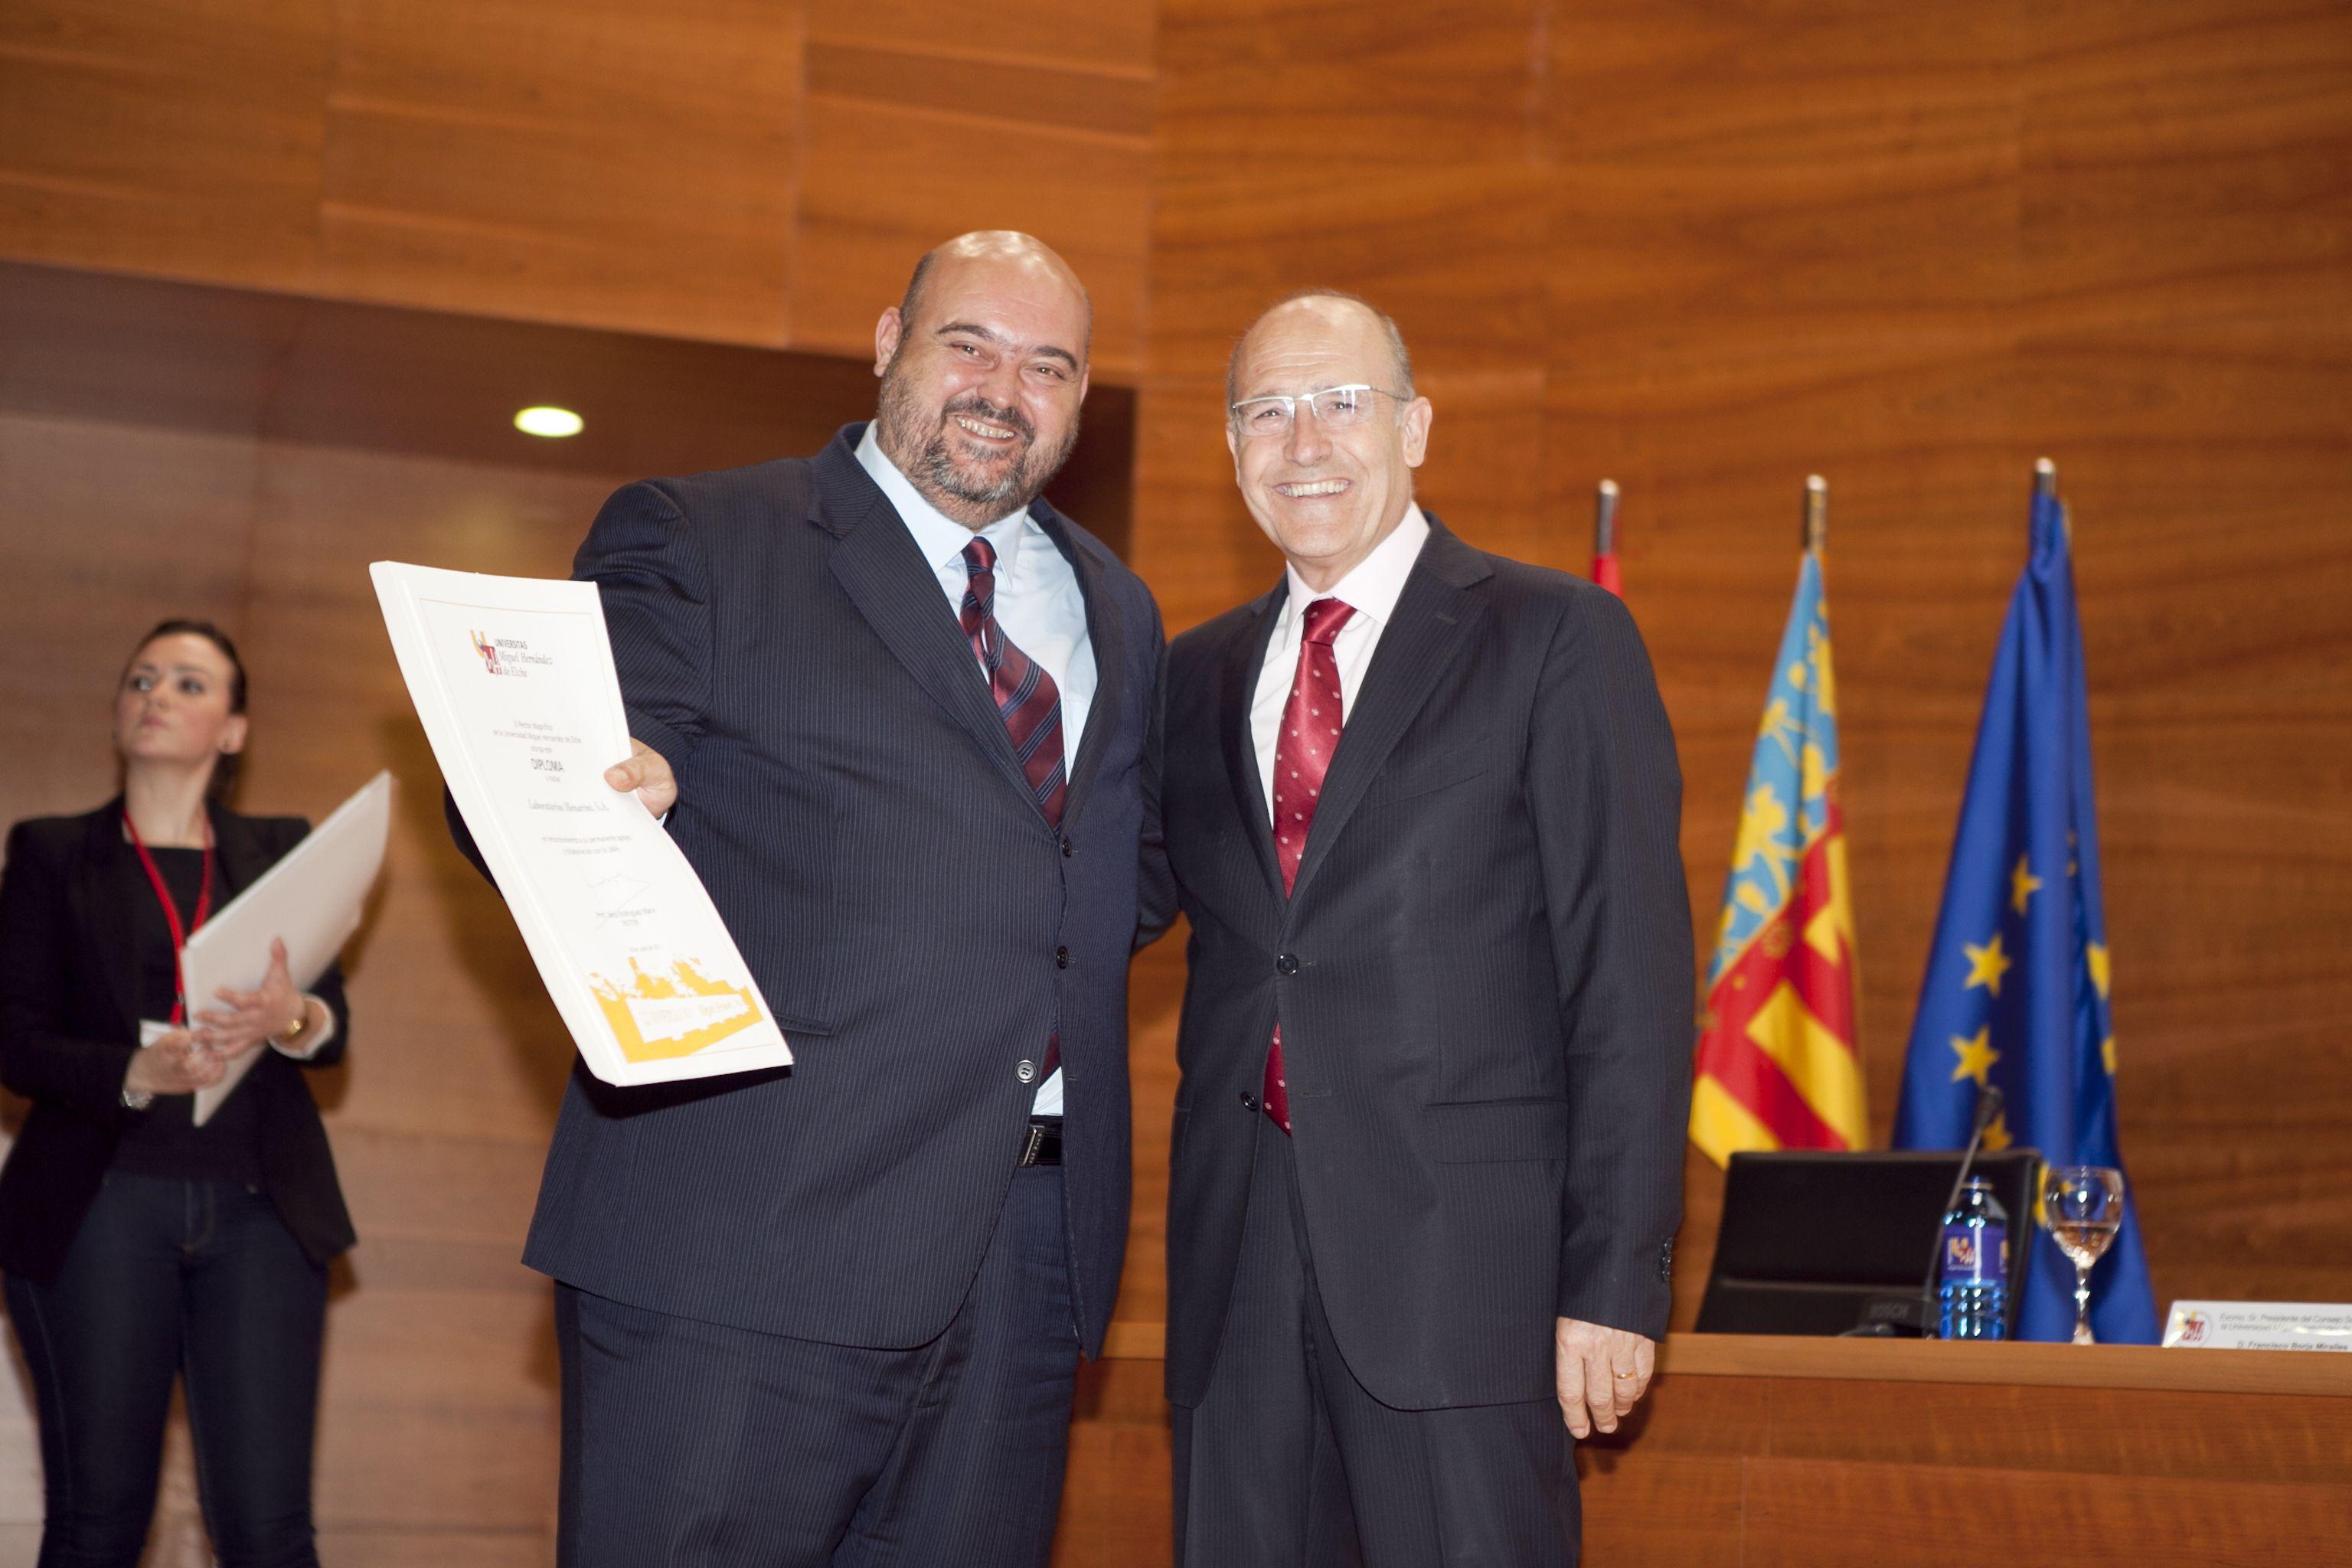 umh-diplomas-rector_mg_6787.jpg